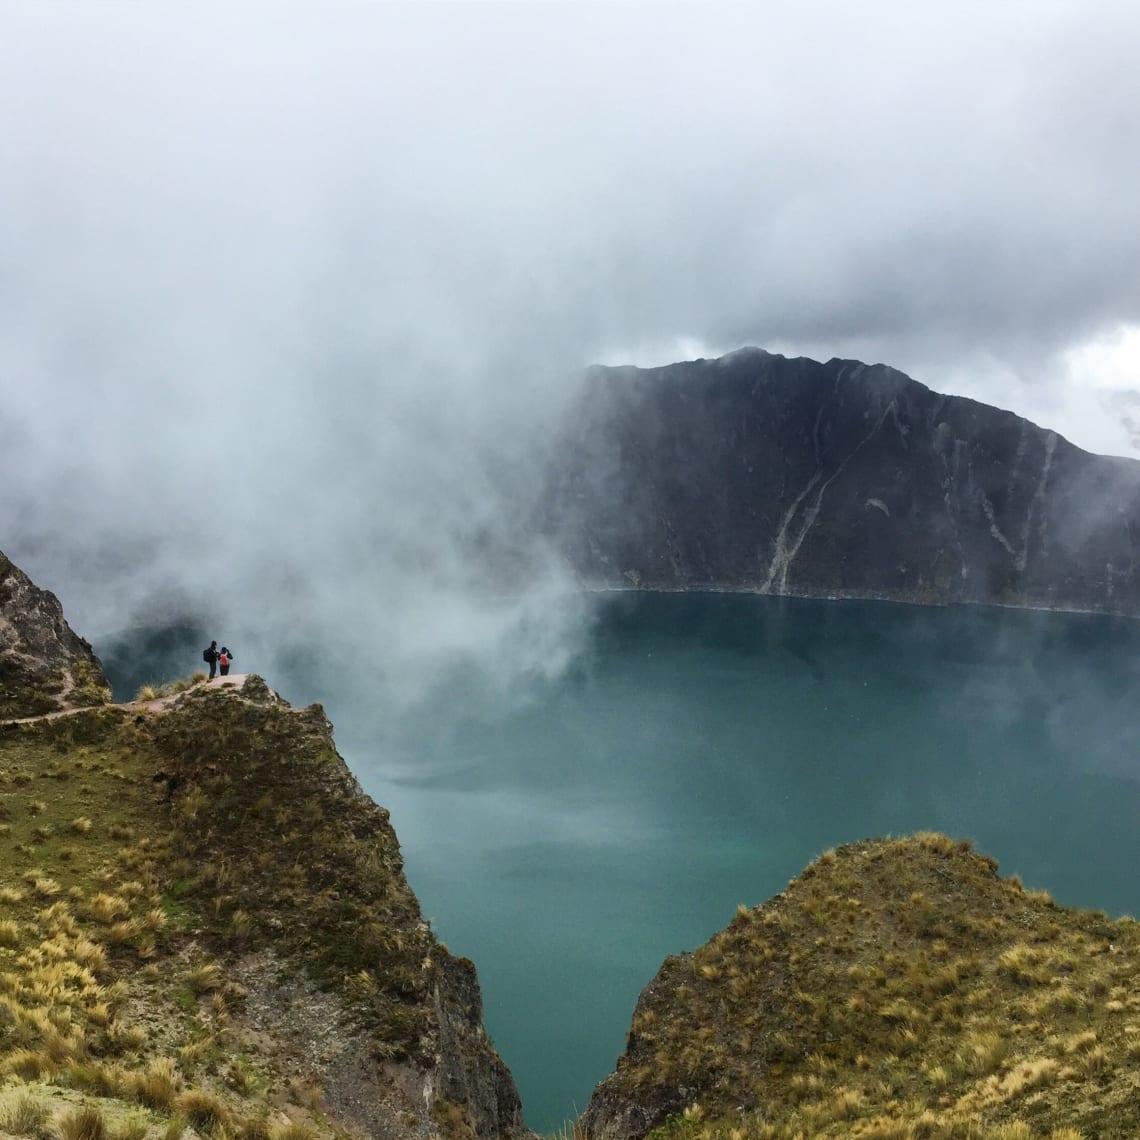 Expat adventures on the Quilotoa loop trail, Ecuador